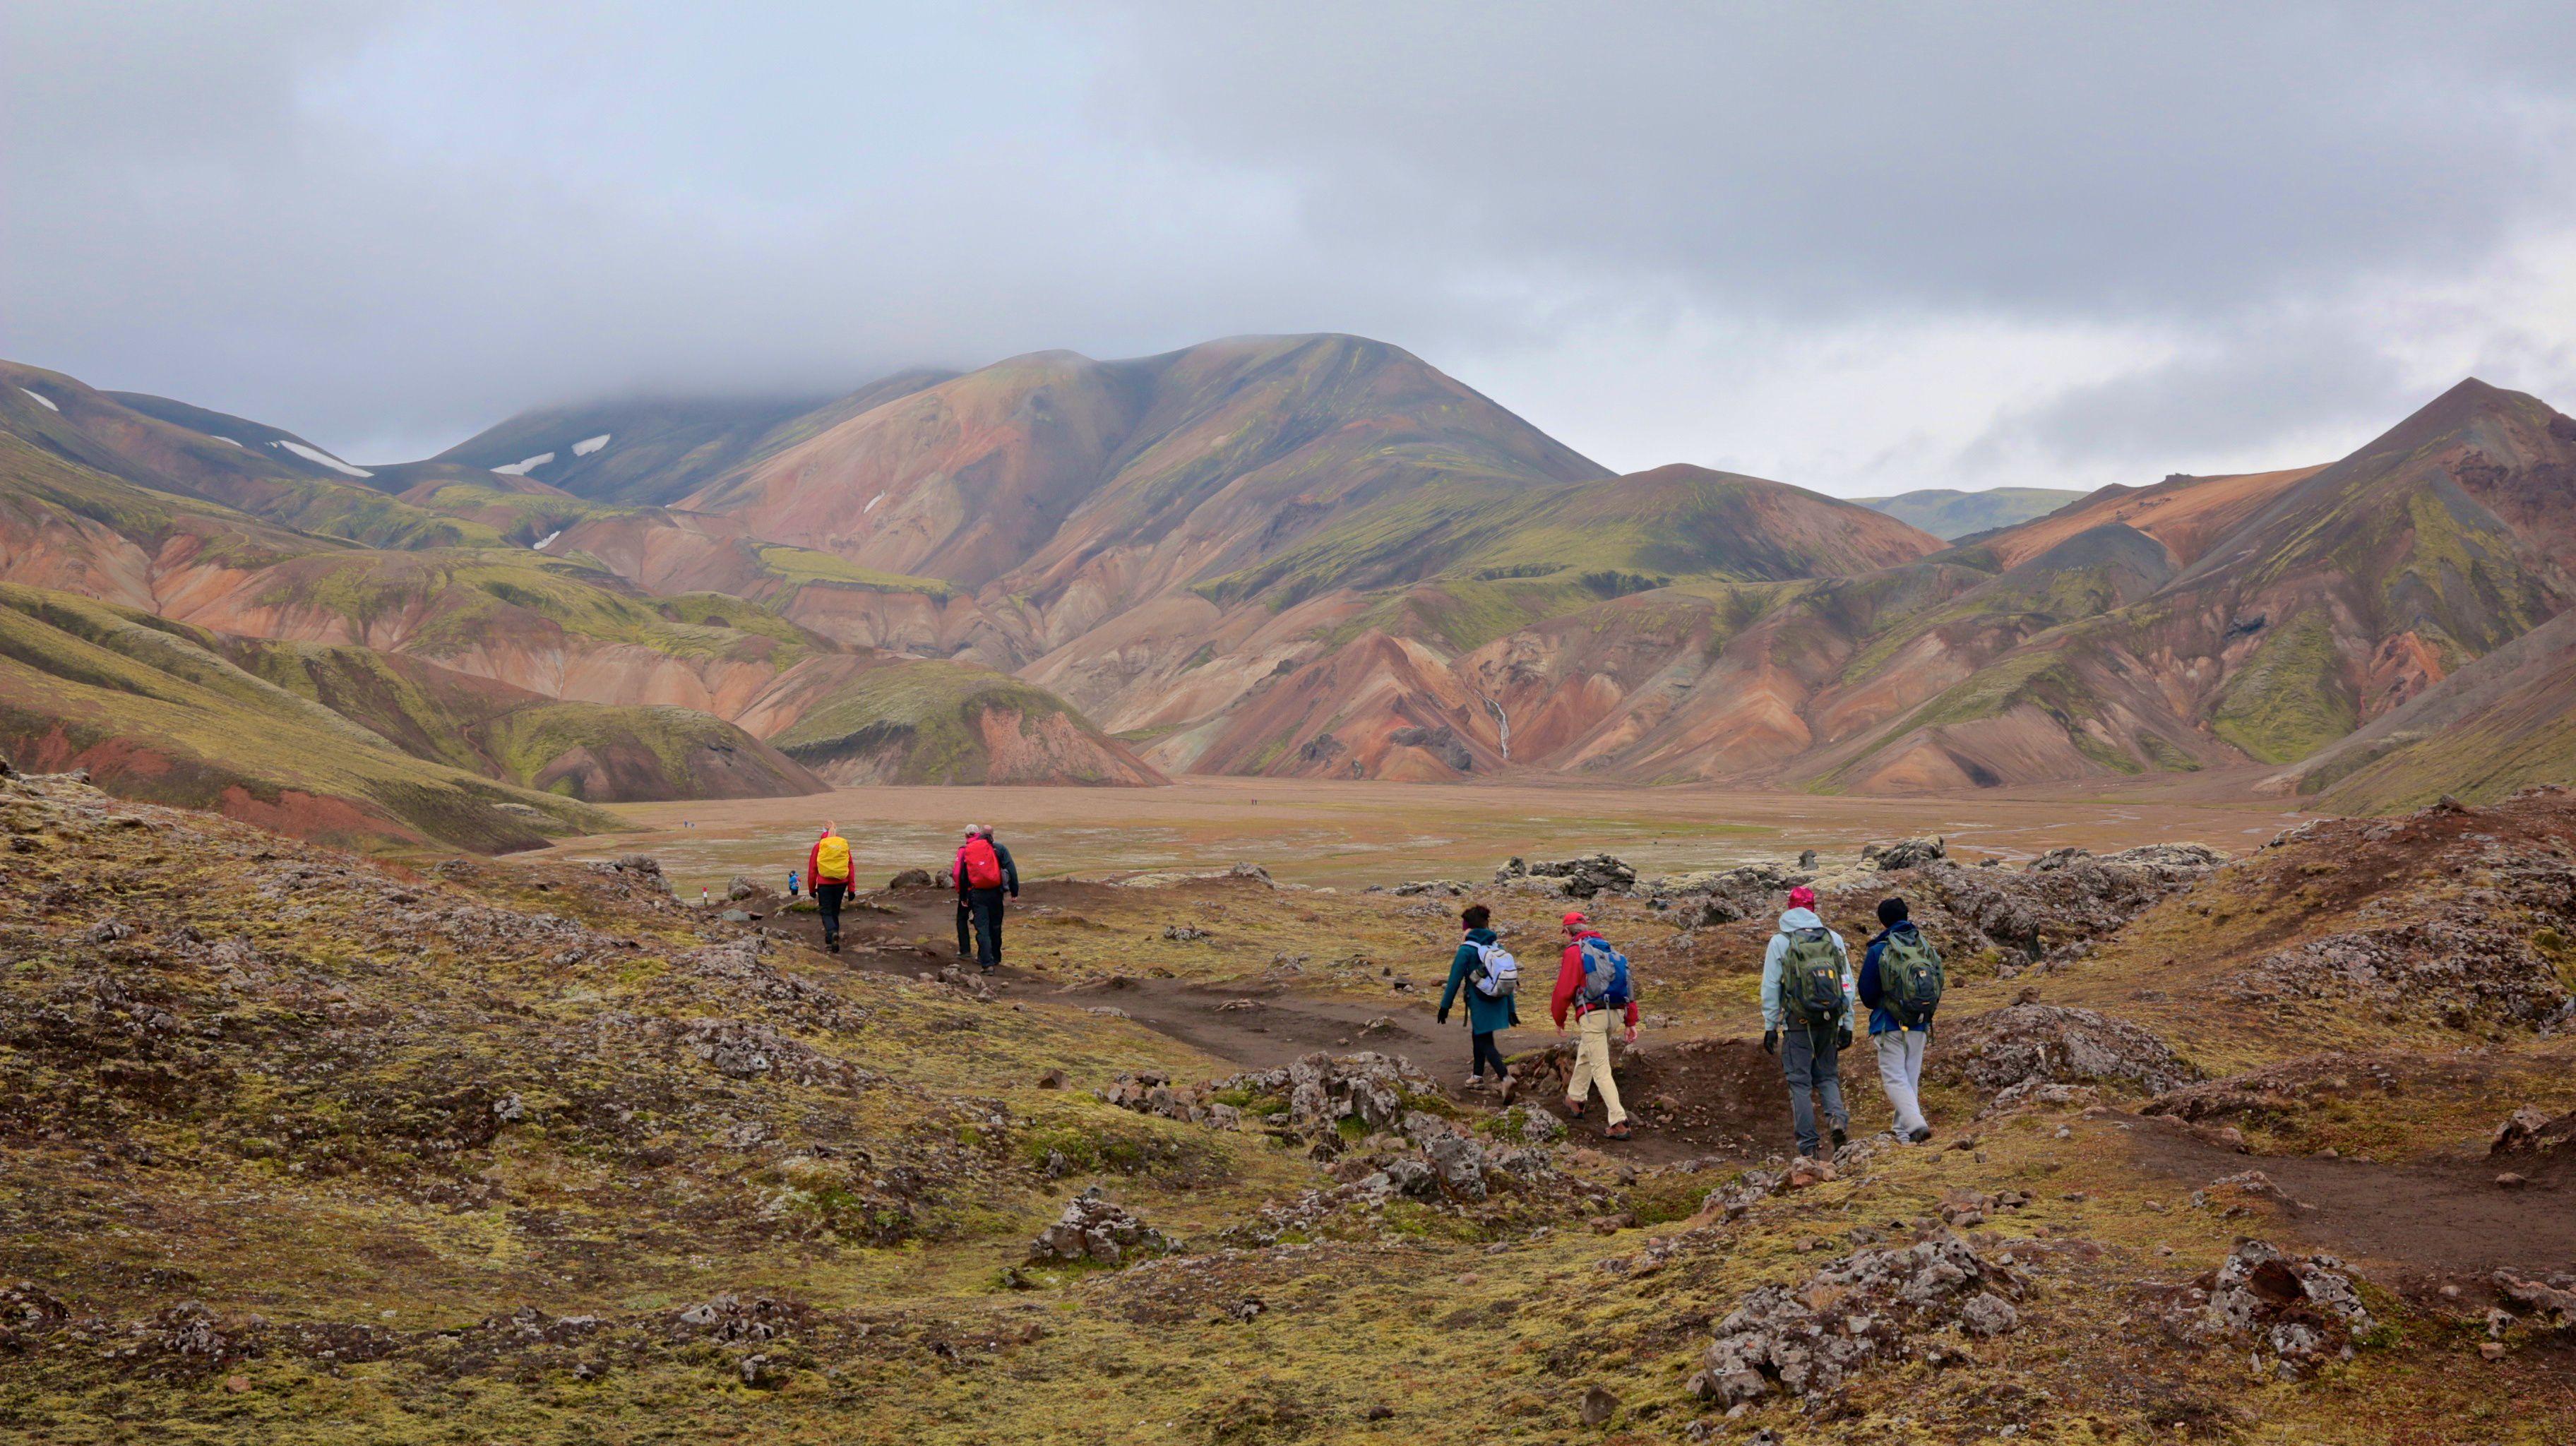 Wandergruppe auf dem Volcanic Trail Teil 1